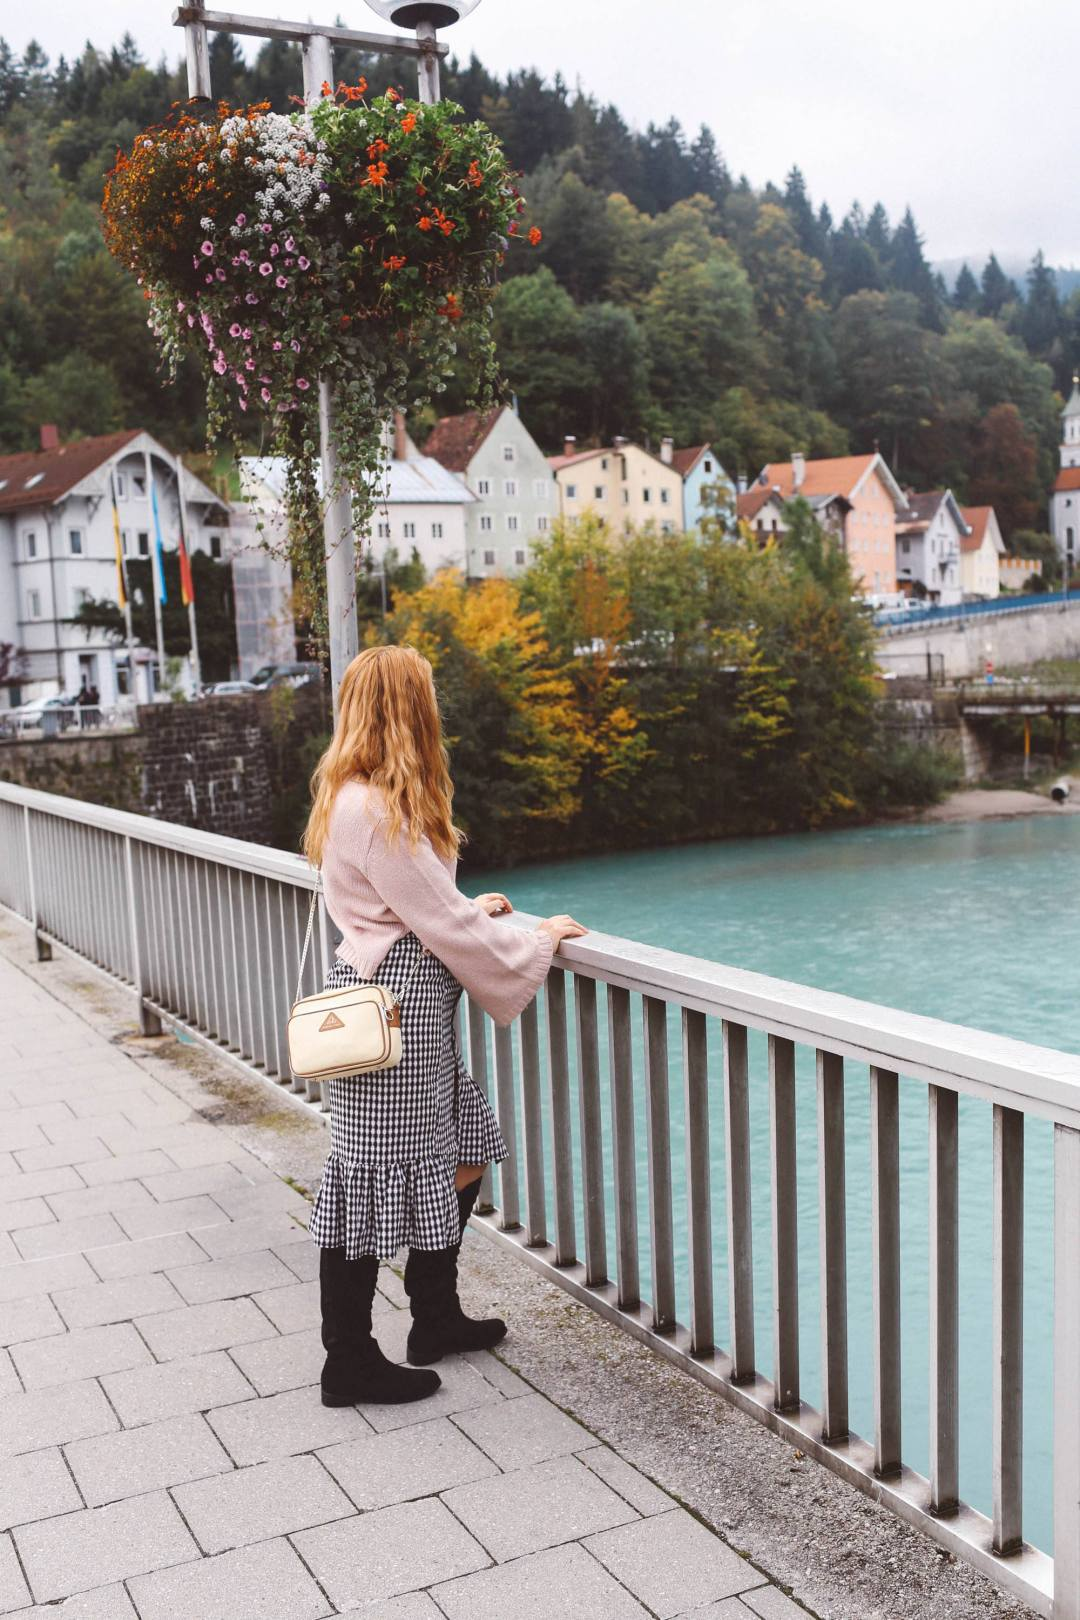 Füssen, Germany pink sweater gingham skirt river water houses